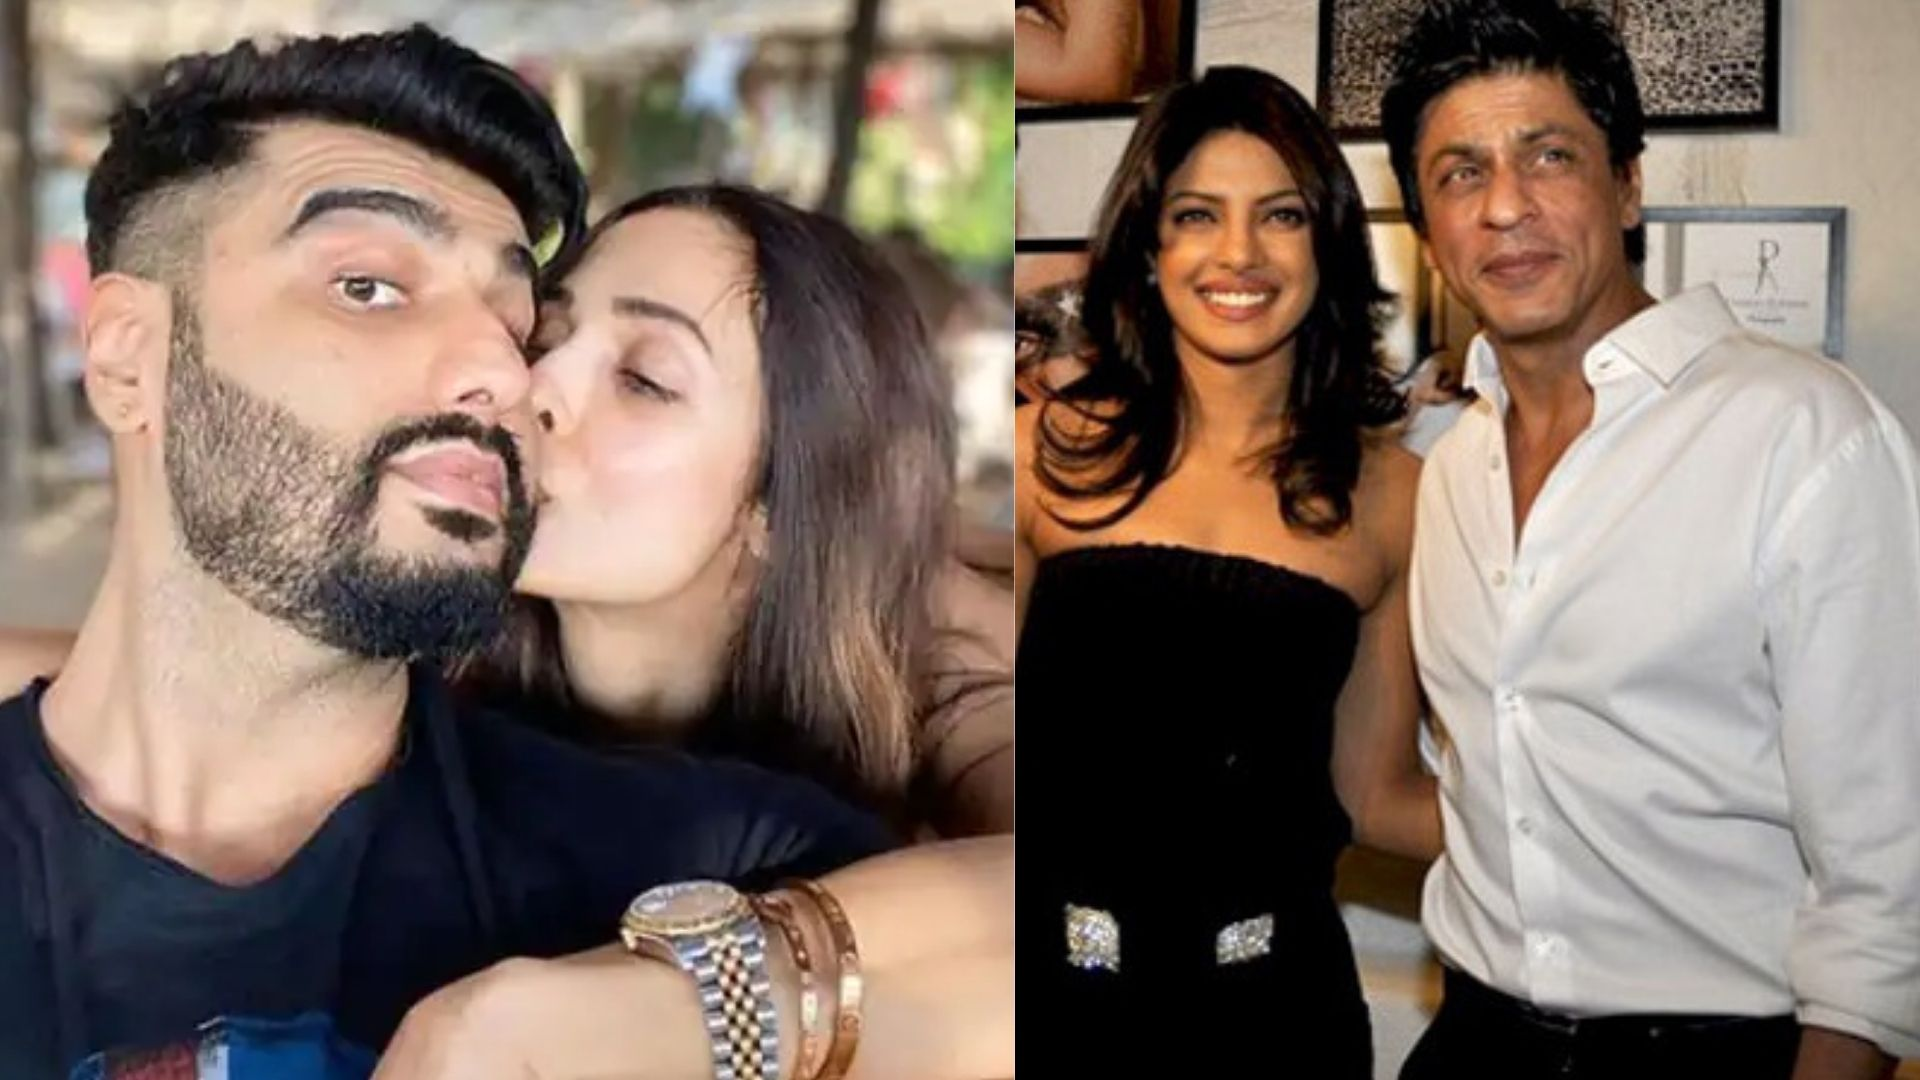 Bollywood Celebrities Like Shah Rukh Khan And Priyanka Chopra Who Made Headlines With Their Link-ups